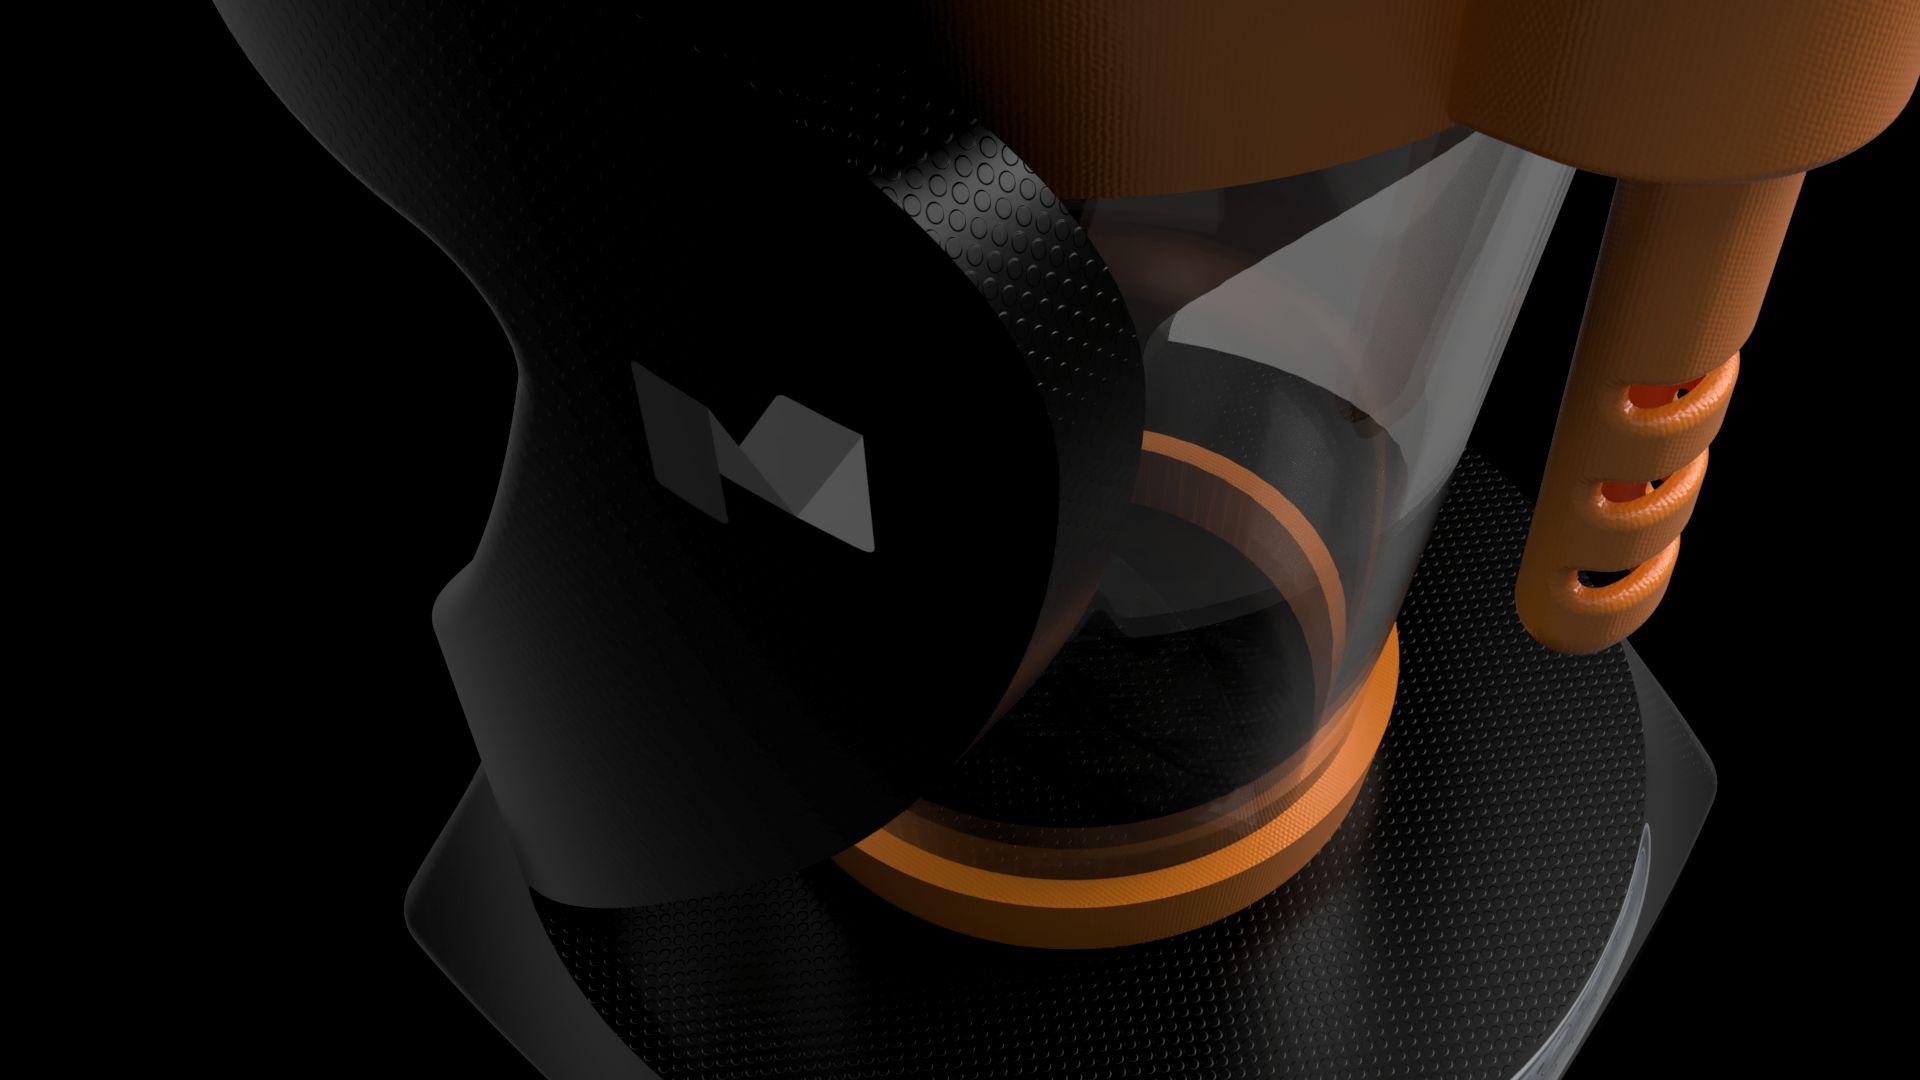 Liq-design-lcs2018-fabrica-de-nerdes-5-3500-3500